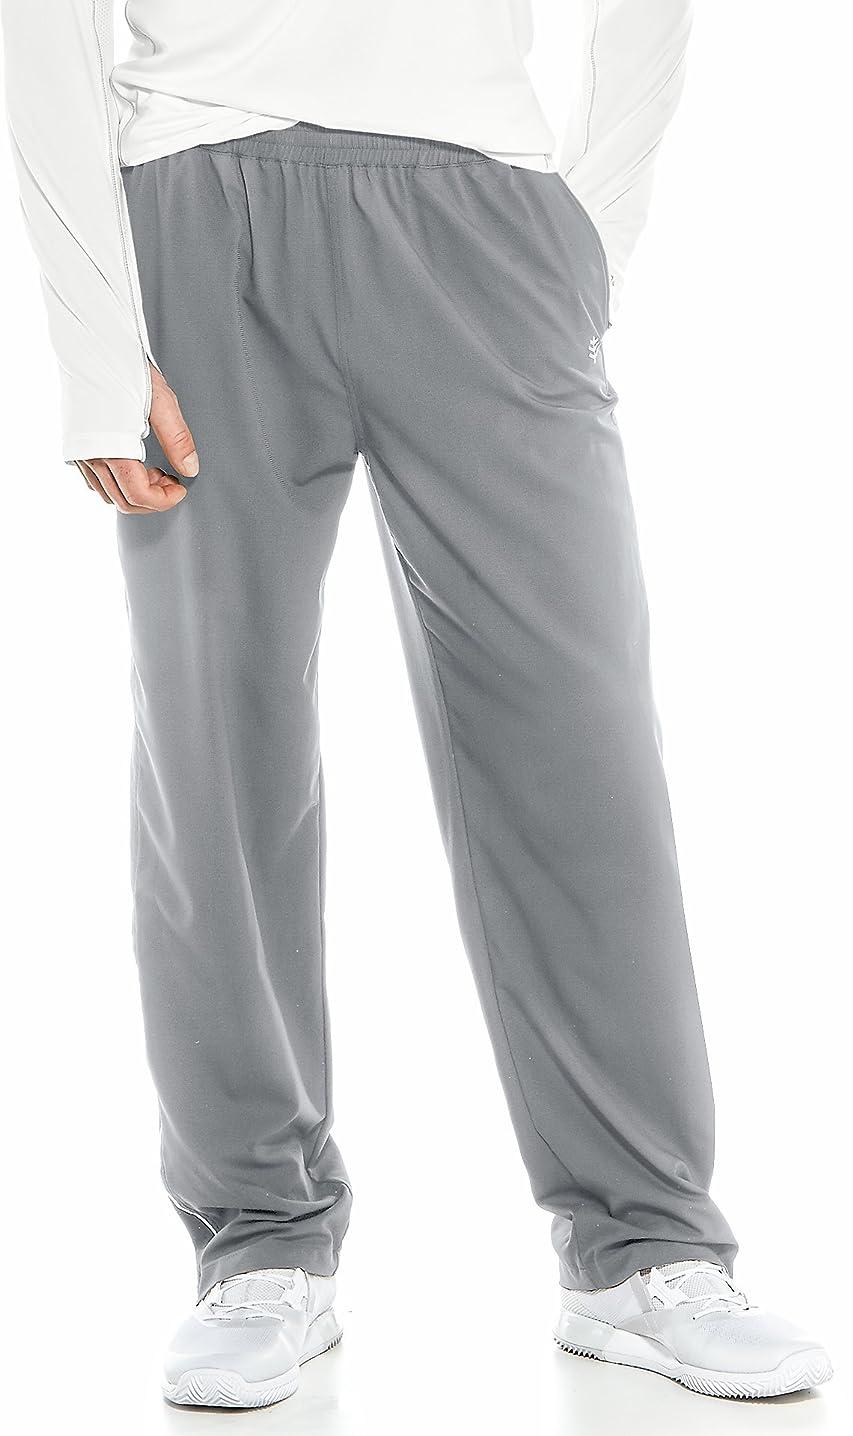 Coolibar UPF 50+ Men's Outpace Sport Pants - Sun Protective